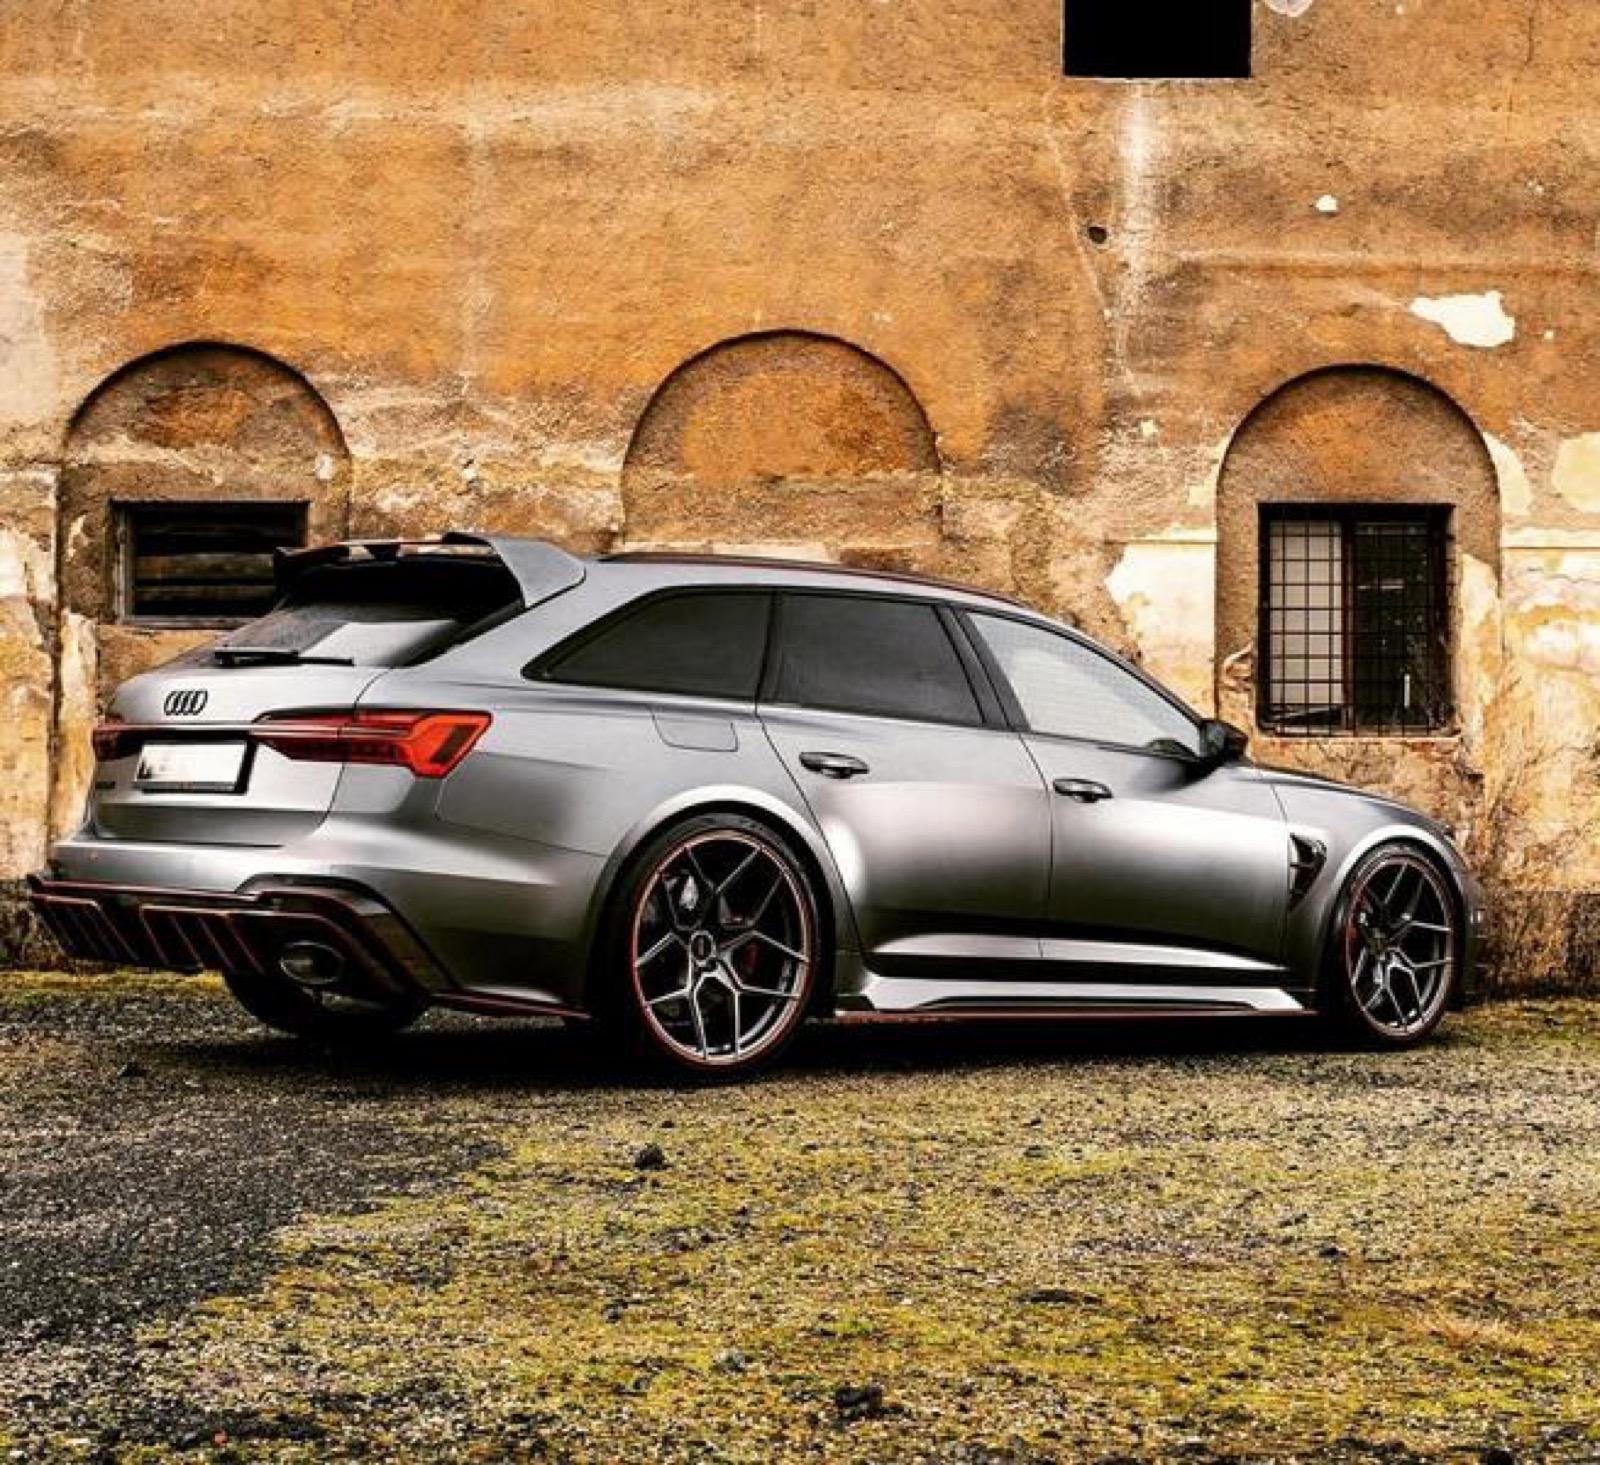 Audi-RS6-Avant-by-Keyvany-11